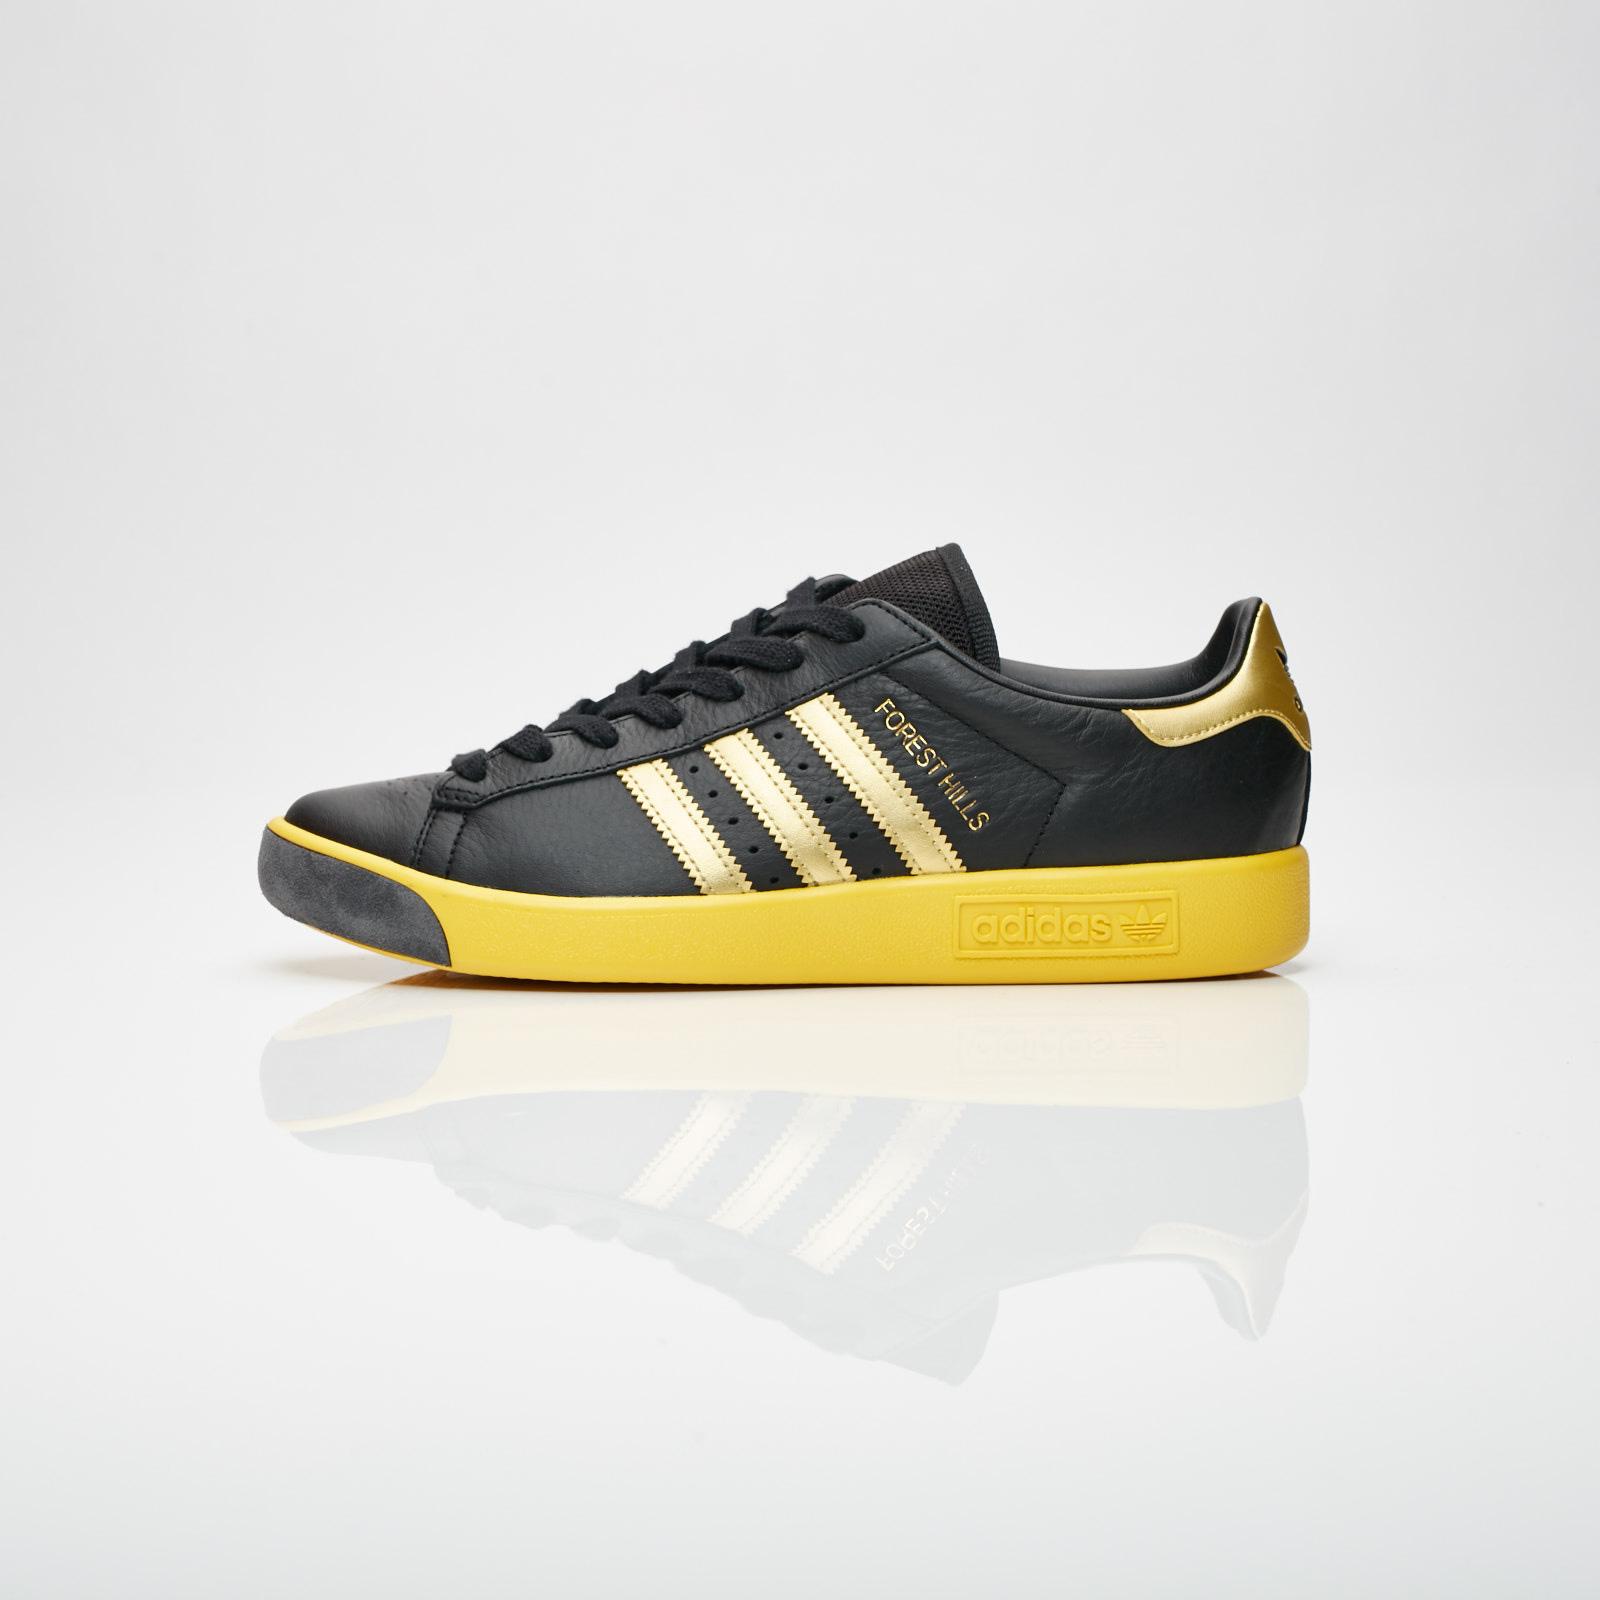 hot sale online 2f309 ccbe8 ... adidas Originals Forest Hills ...